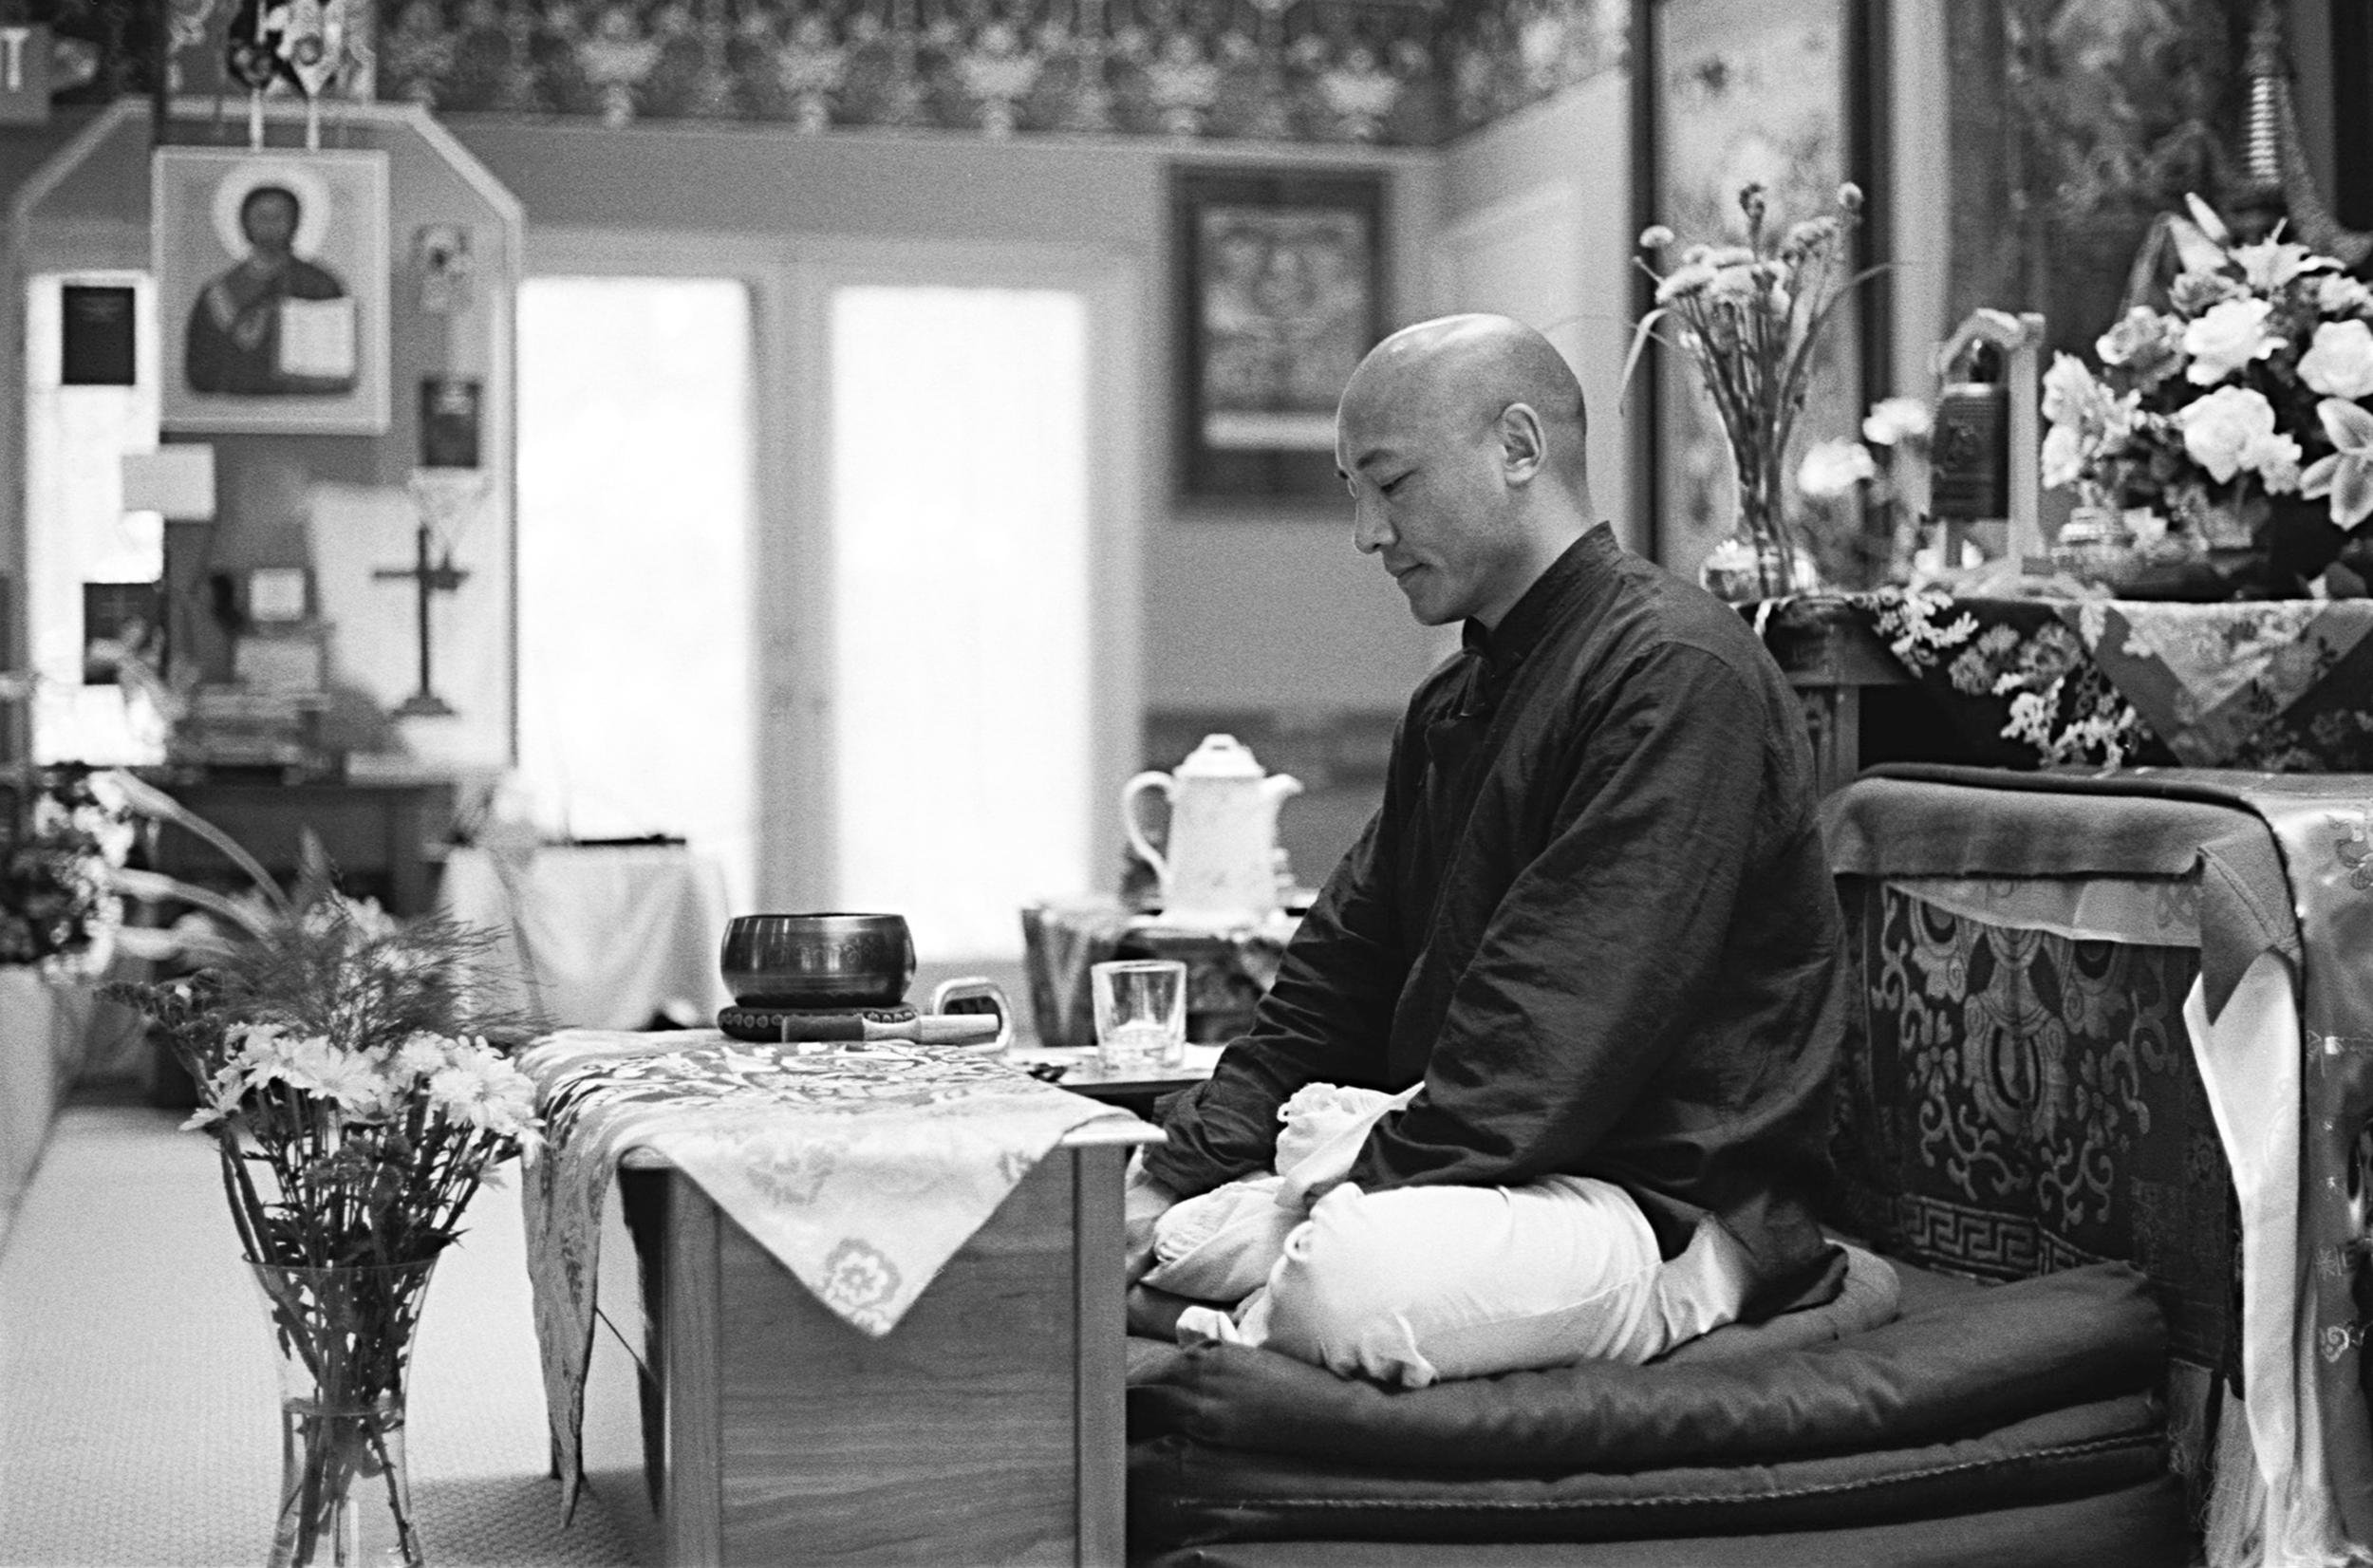 Ven. Anam Thubten Rinpoche in meditation